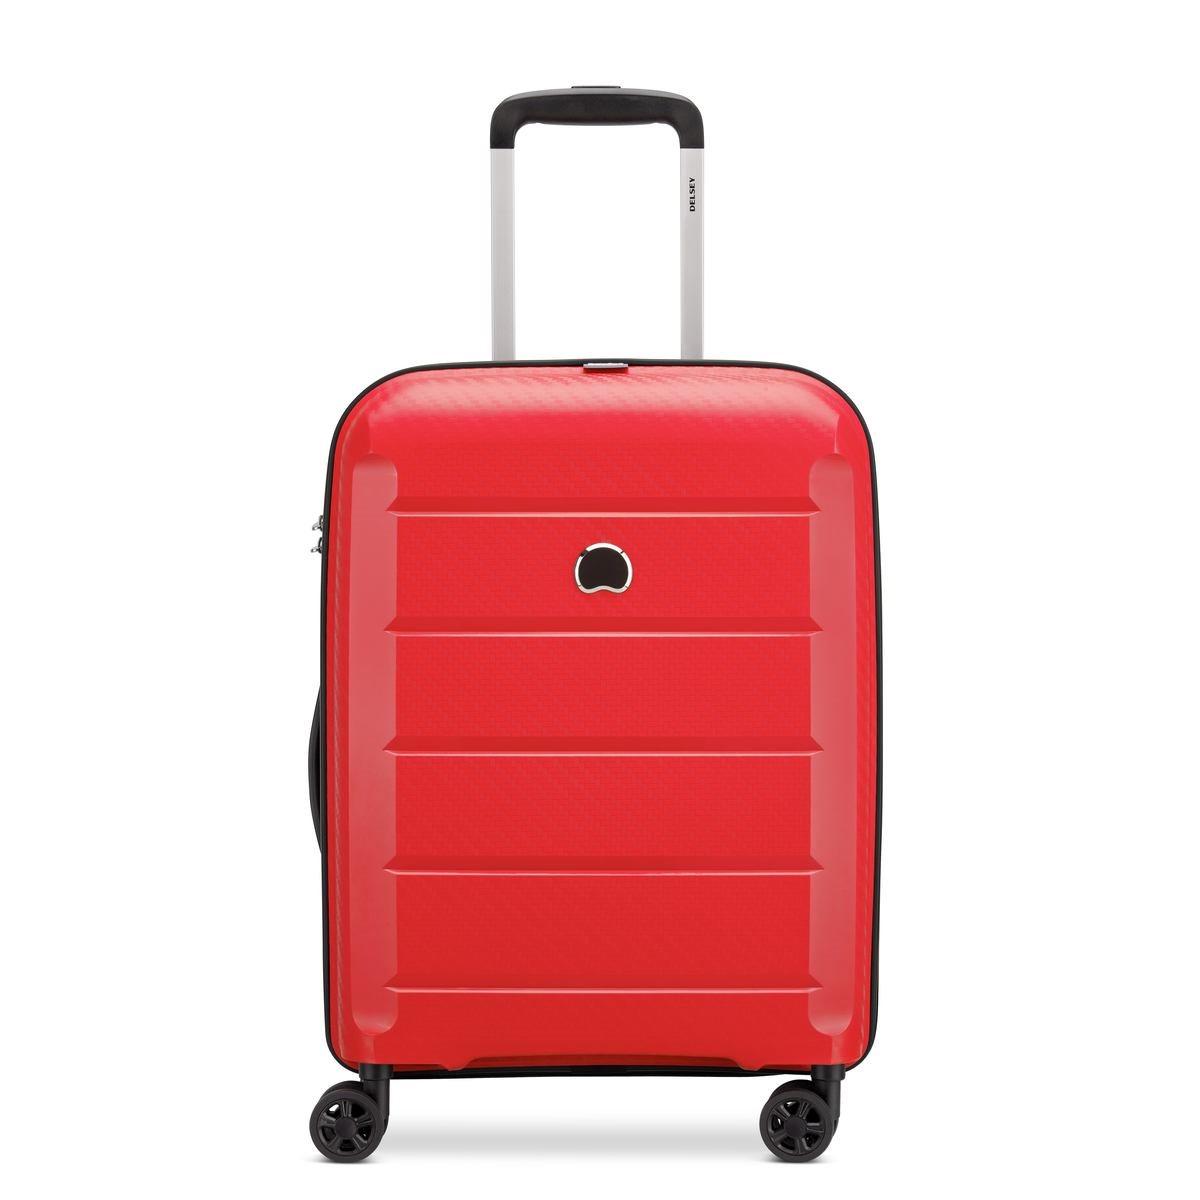 Delsey Βαλίτσα καμπίνας slim 55x40x19cm σειρά Binalog Red